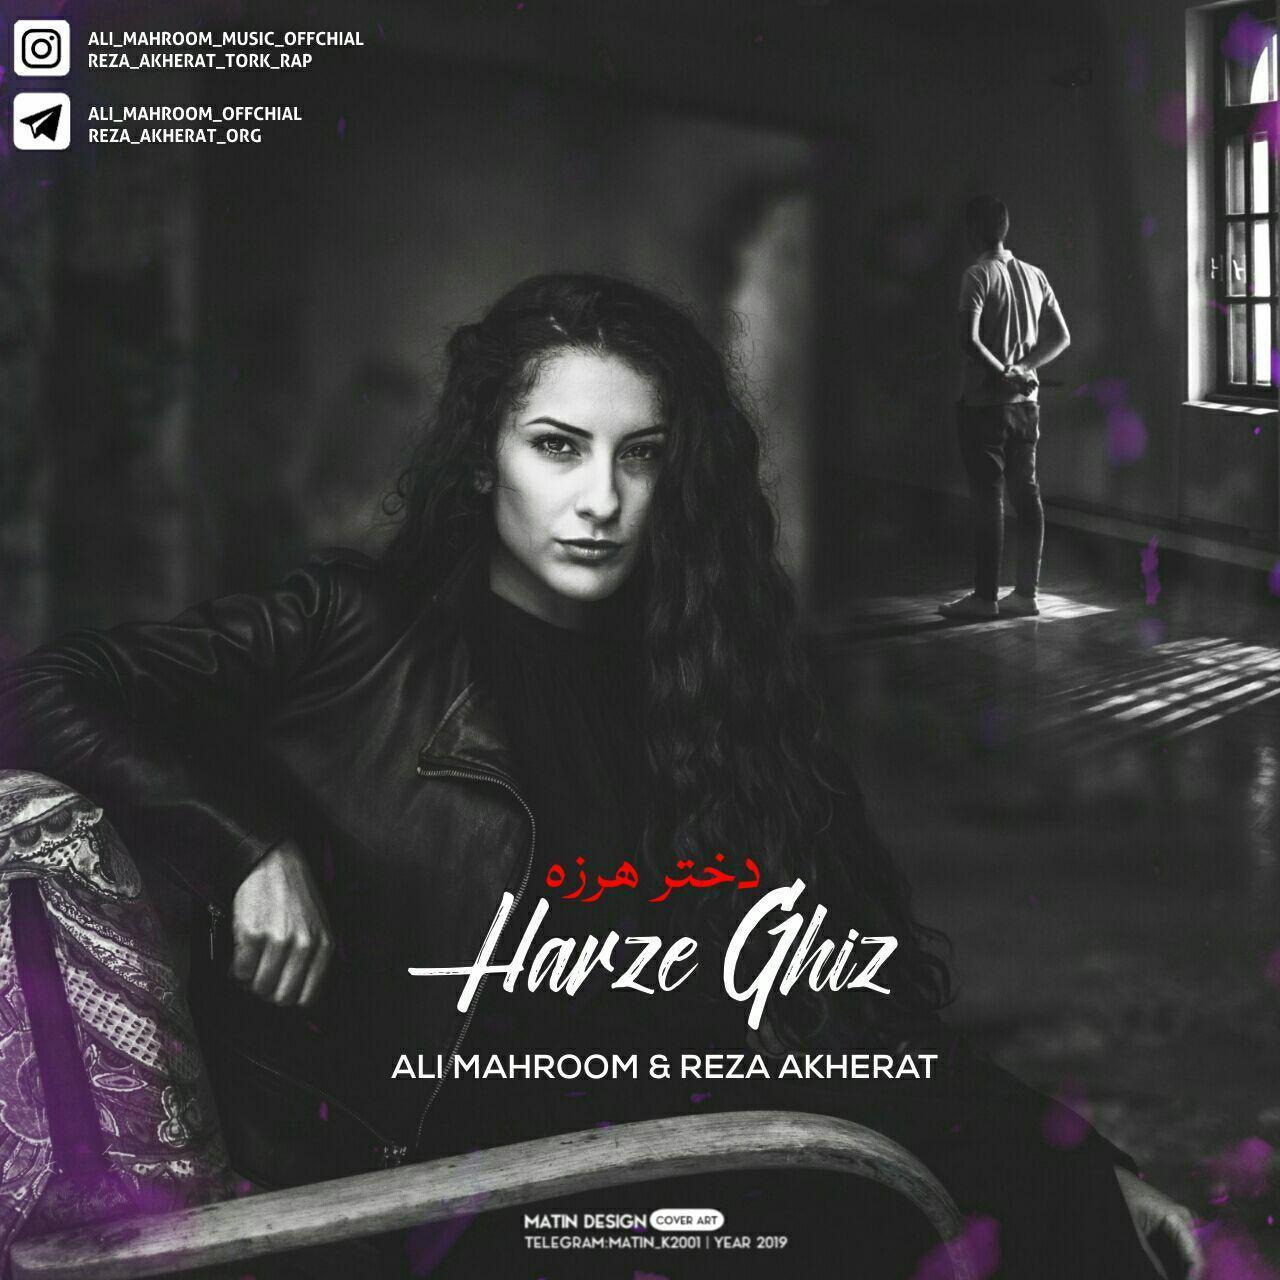 http://s8.picofile.com/file/8368094042/02Ali_Mahroom_Feat_Reza_Akherat_Harze_Ghiz.jpg